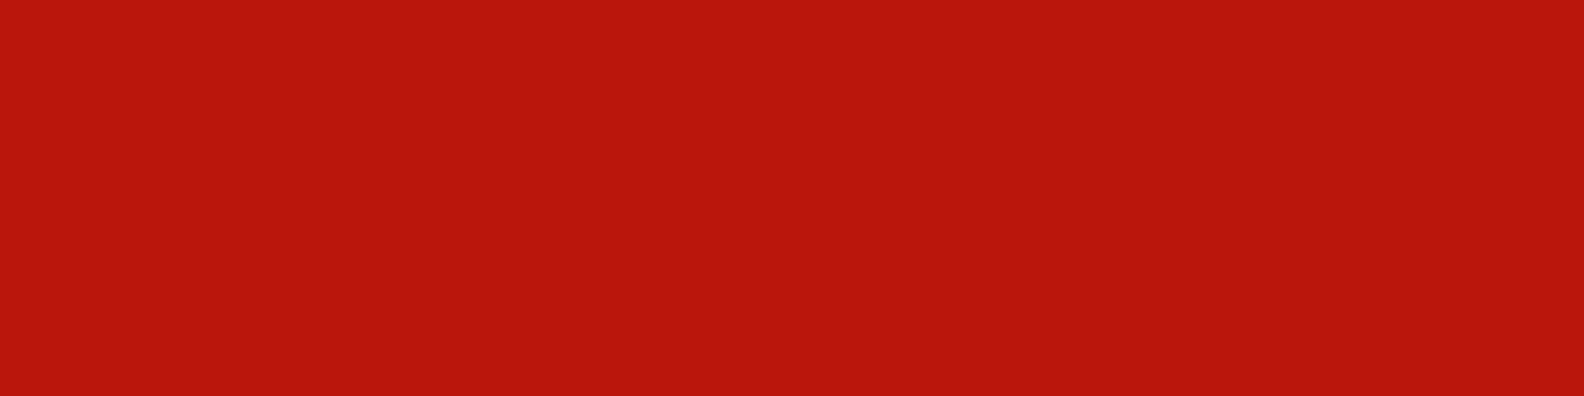 1584x396 International Orange Engineering Solid Color Background